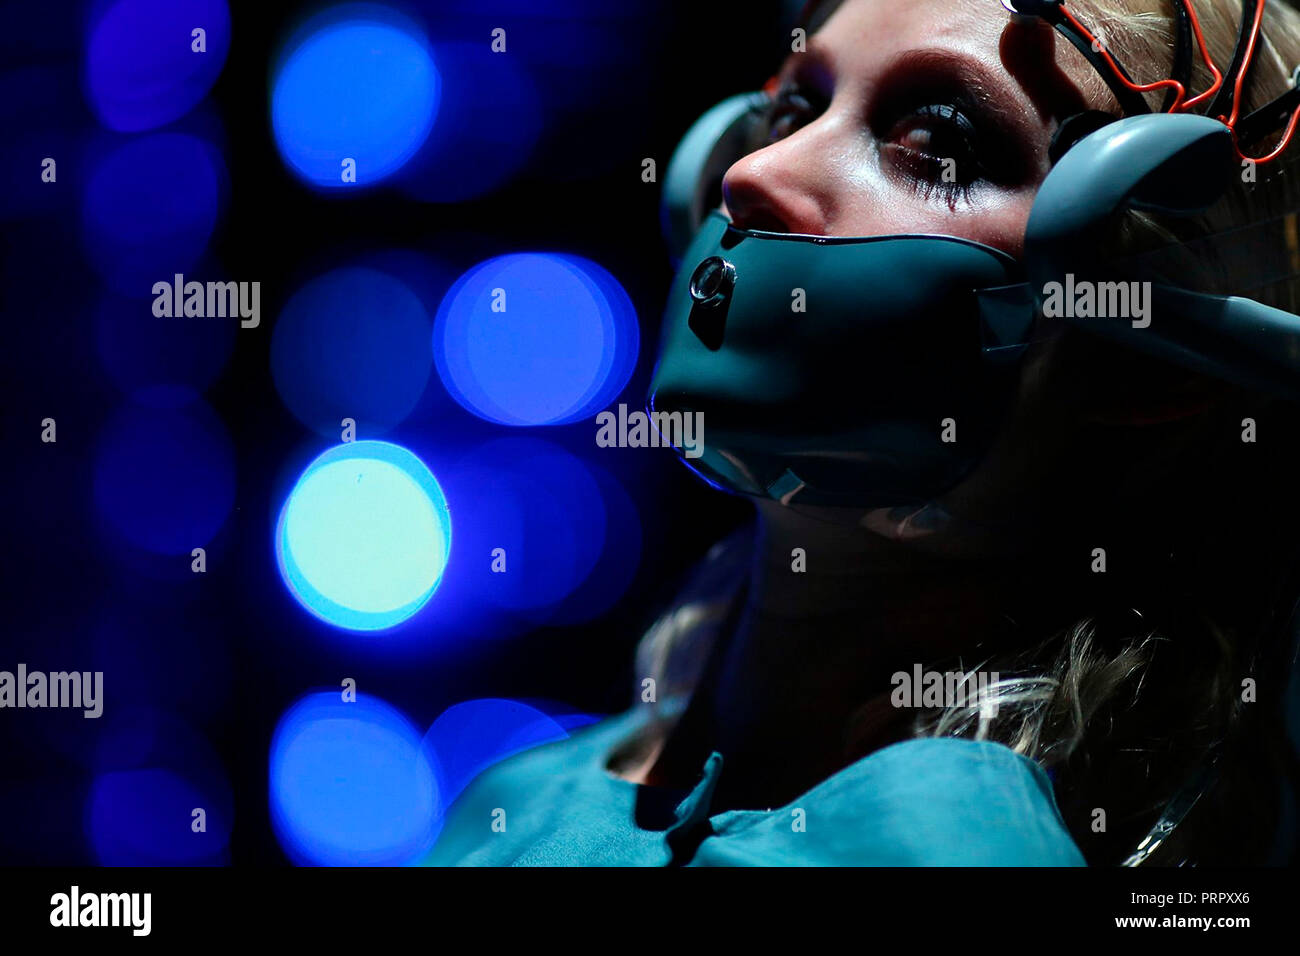 Prod DB © Sanja Bucko - Netflix - Addictive Pictures - Kaos Theory Entertainment - Phantom 4 Films - Rhea Films - Waypoint Entertainment / DR TAU de F - Stock Image